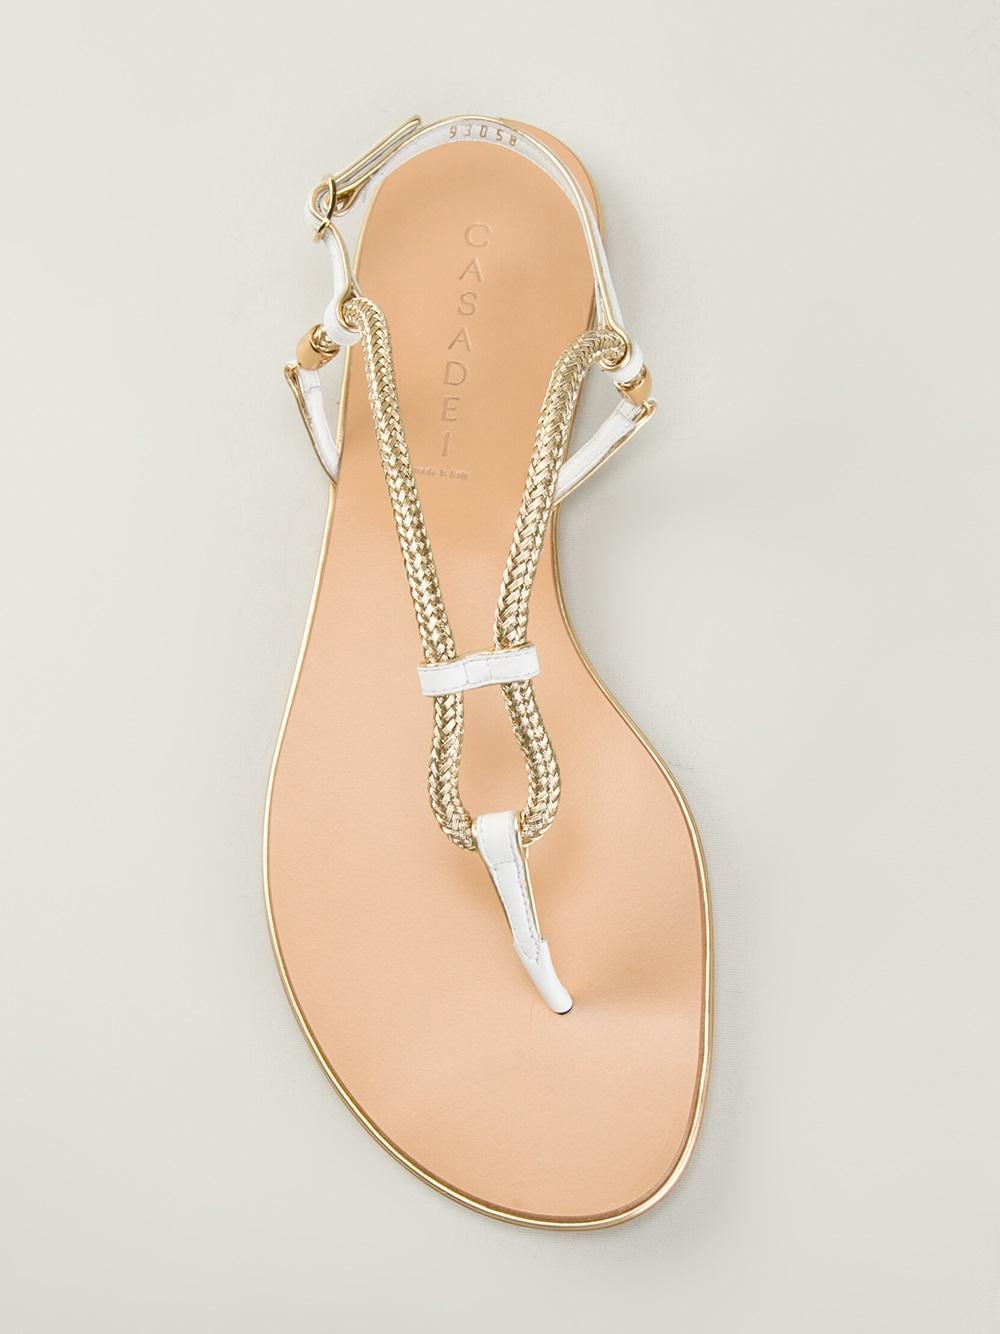 94555ac0480 Lyst - Casadei Flat Sandals in Metallic